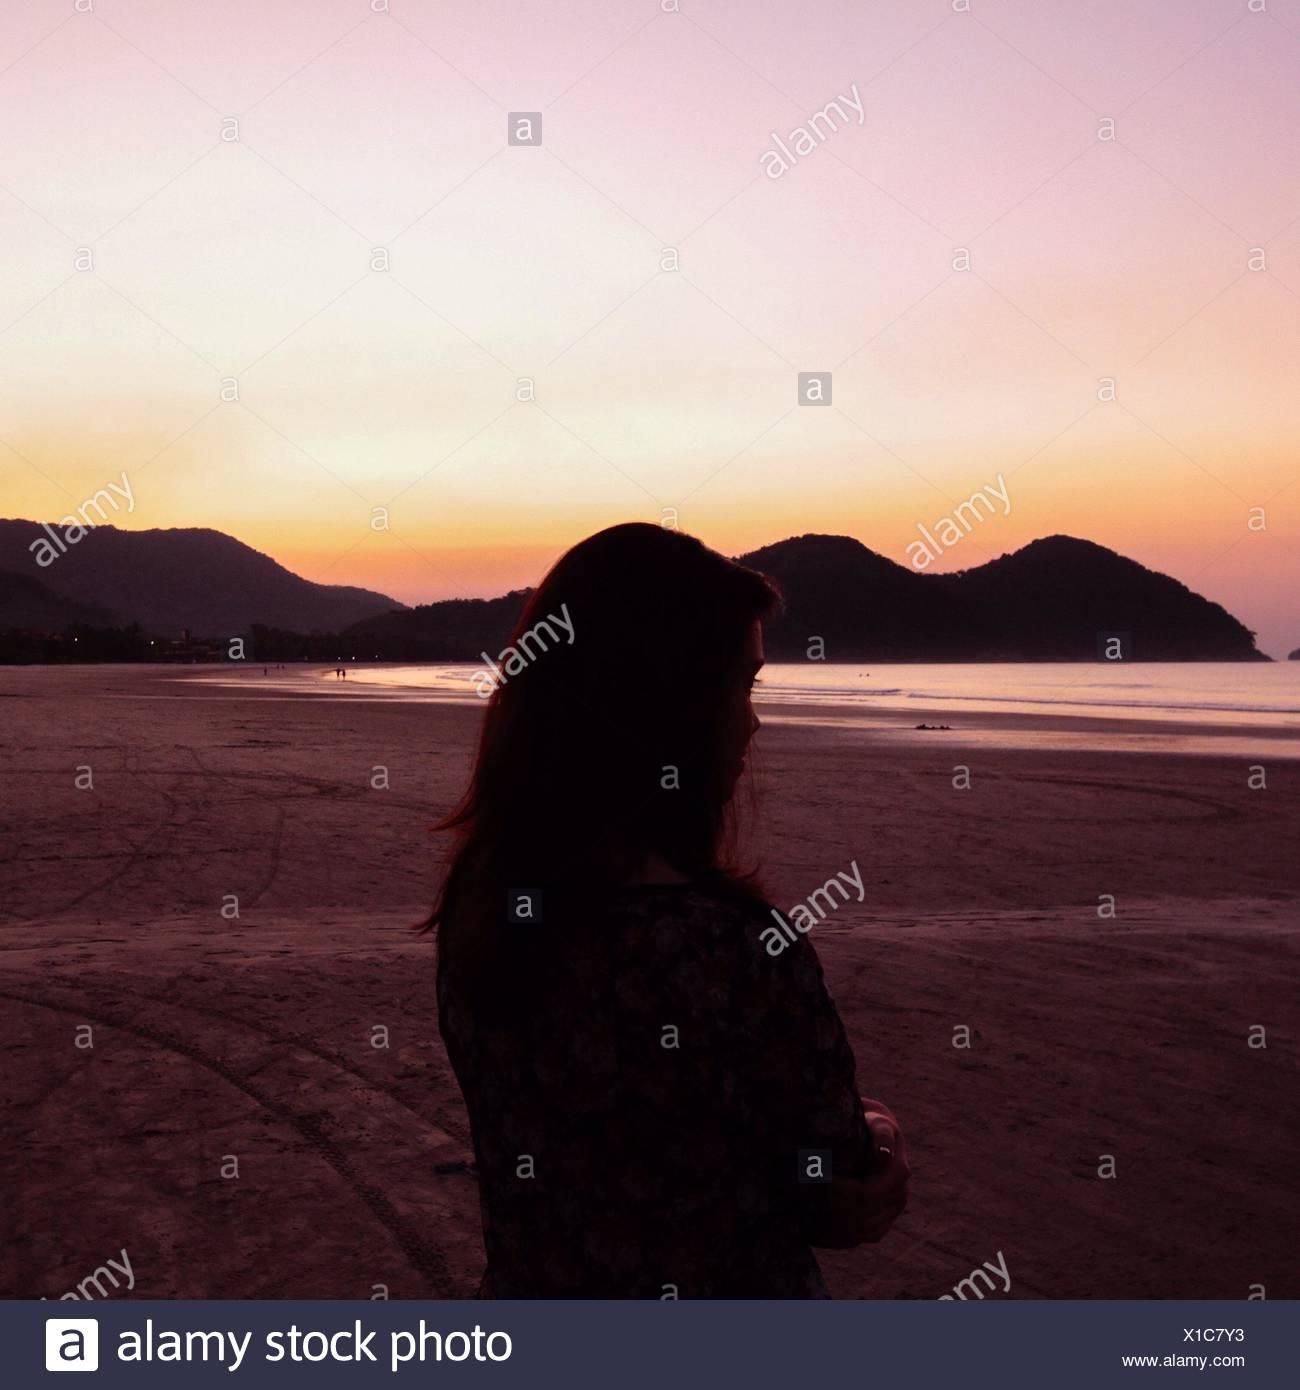 Silhouette of Woman On Beach Photo Stock